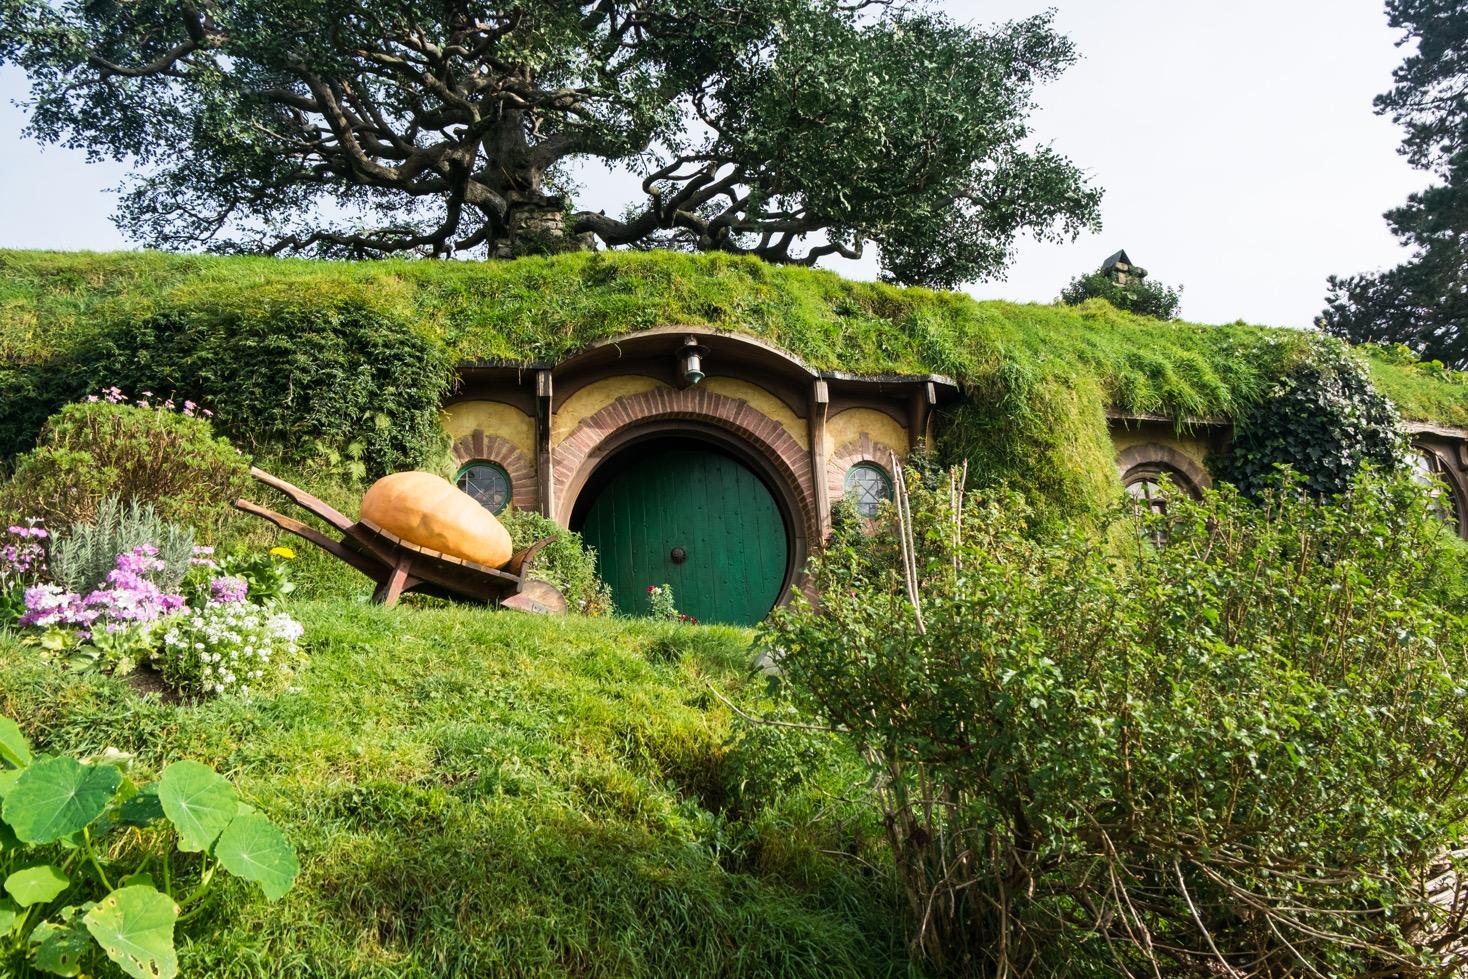 nzeta.my hobbit garden in Hobbiton